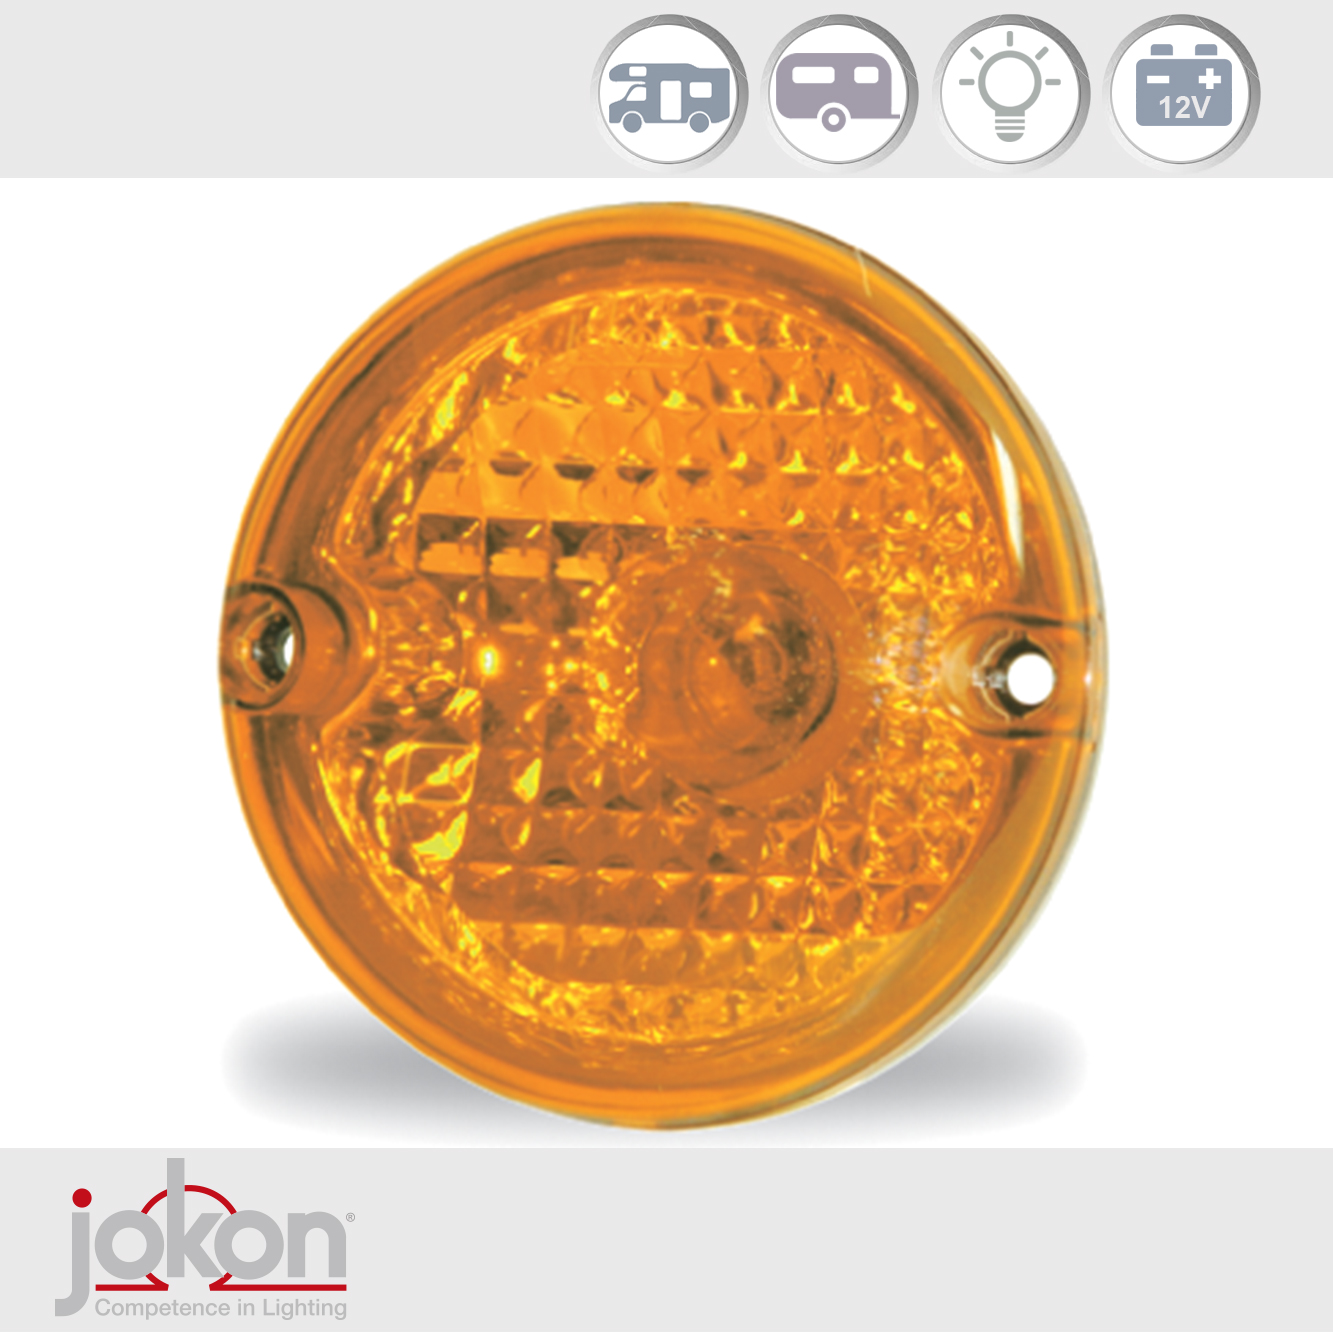 Caravan Motorhome Trailer Direction Light | Jokon E1-1547